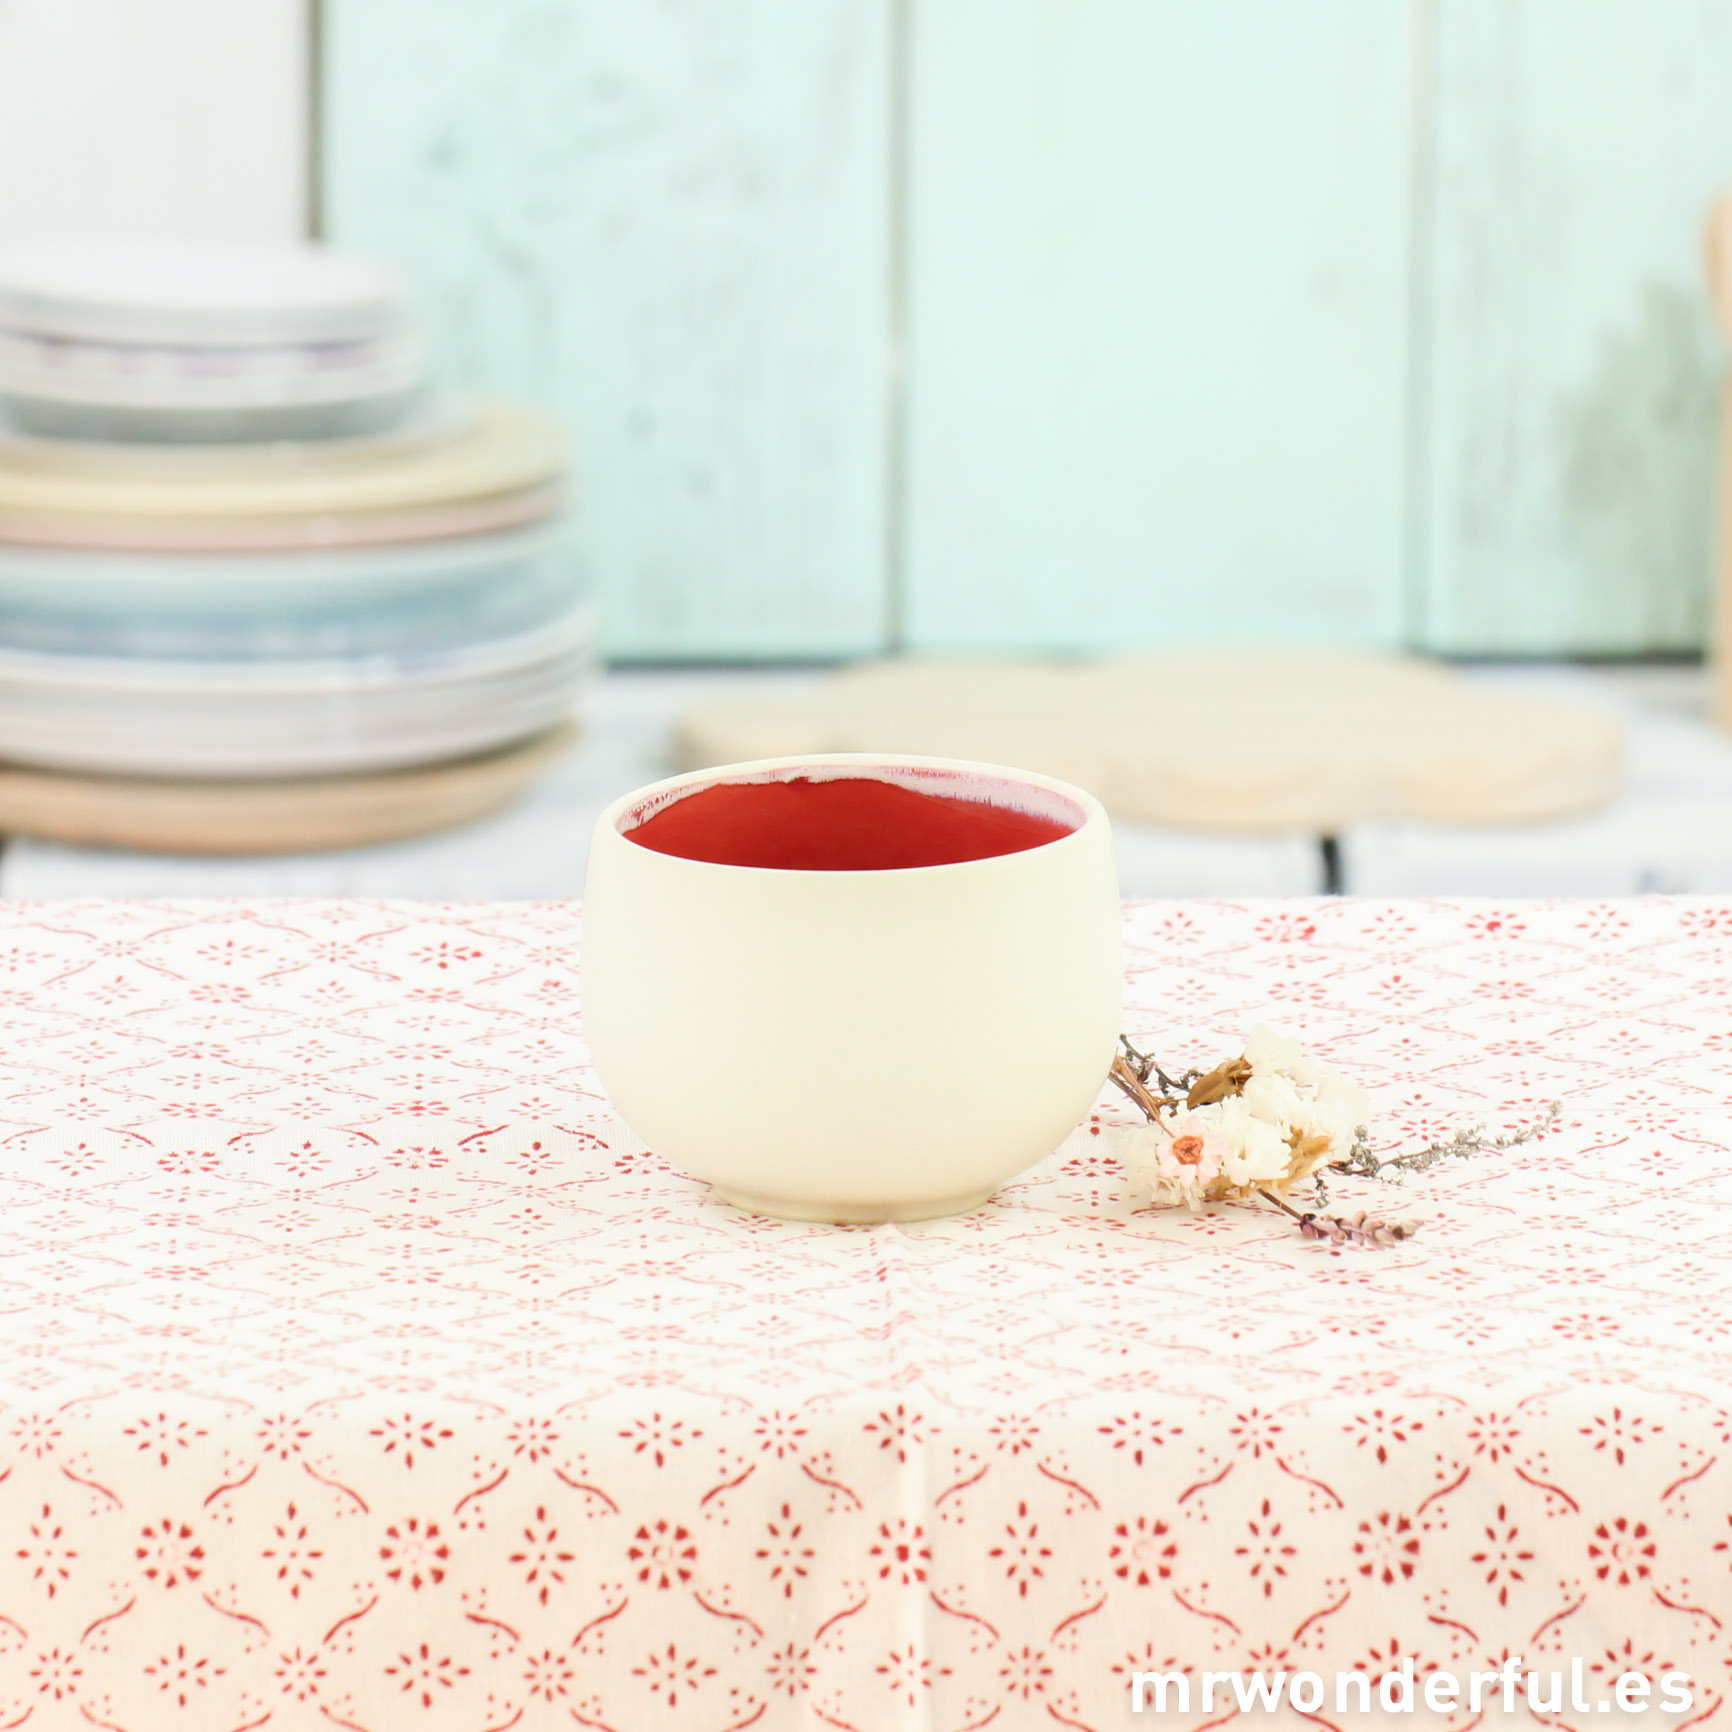 mrwonderful_056108_vaso-redondo-ceramica_beige-rojo-1